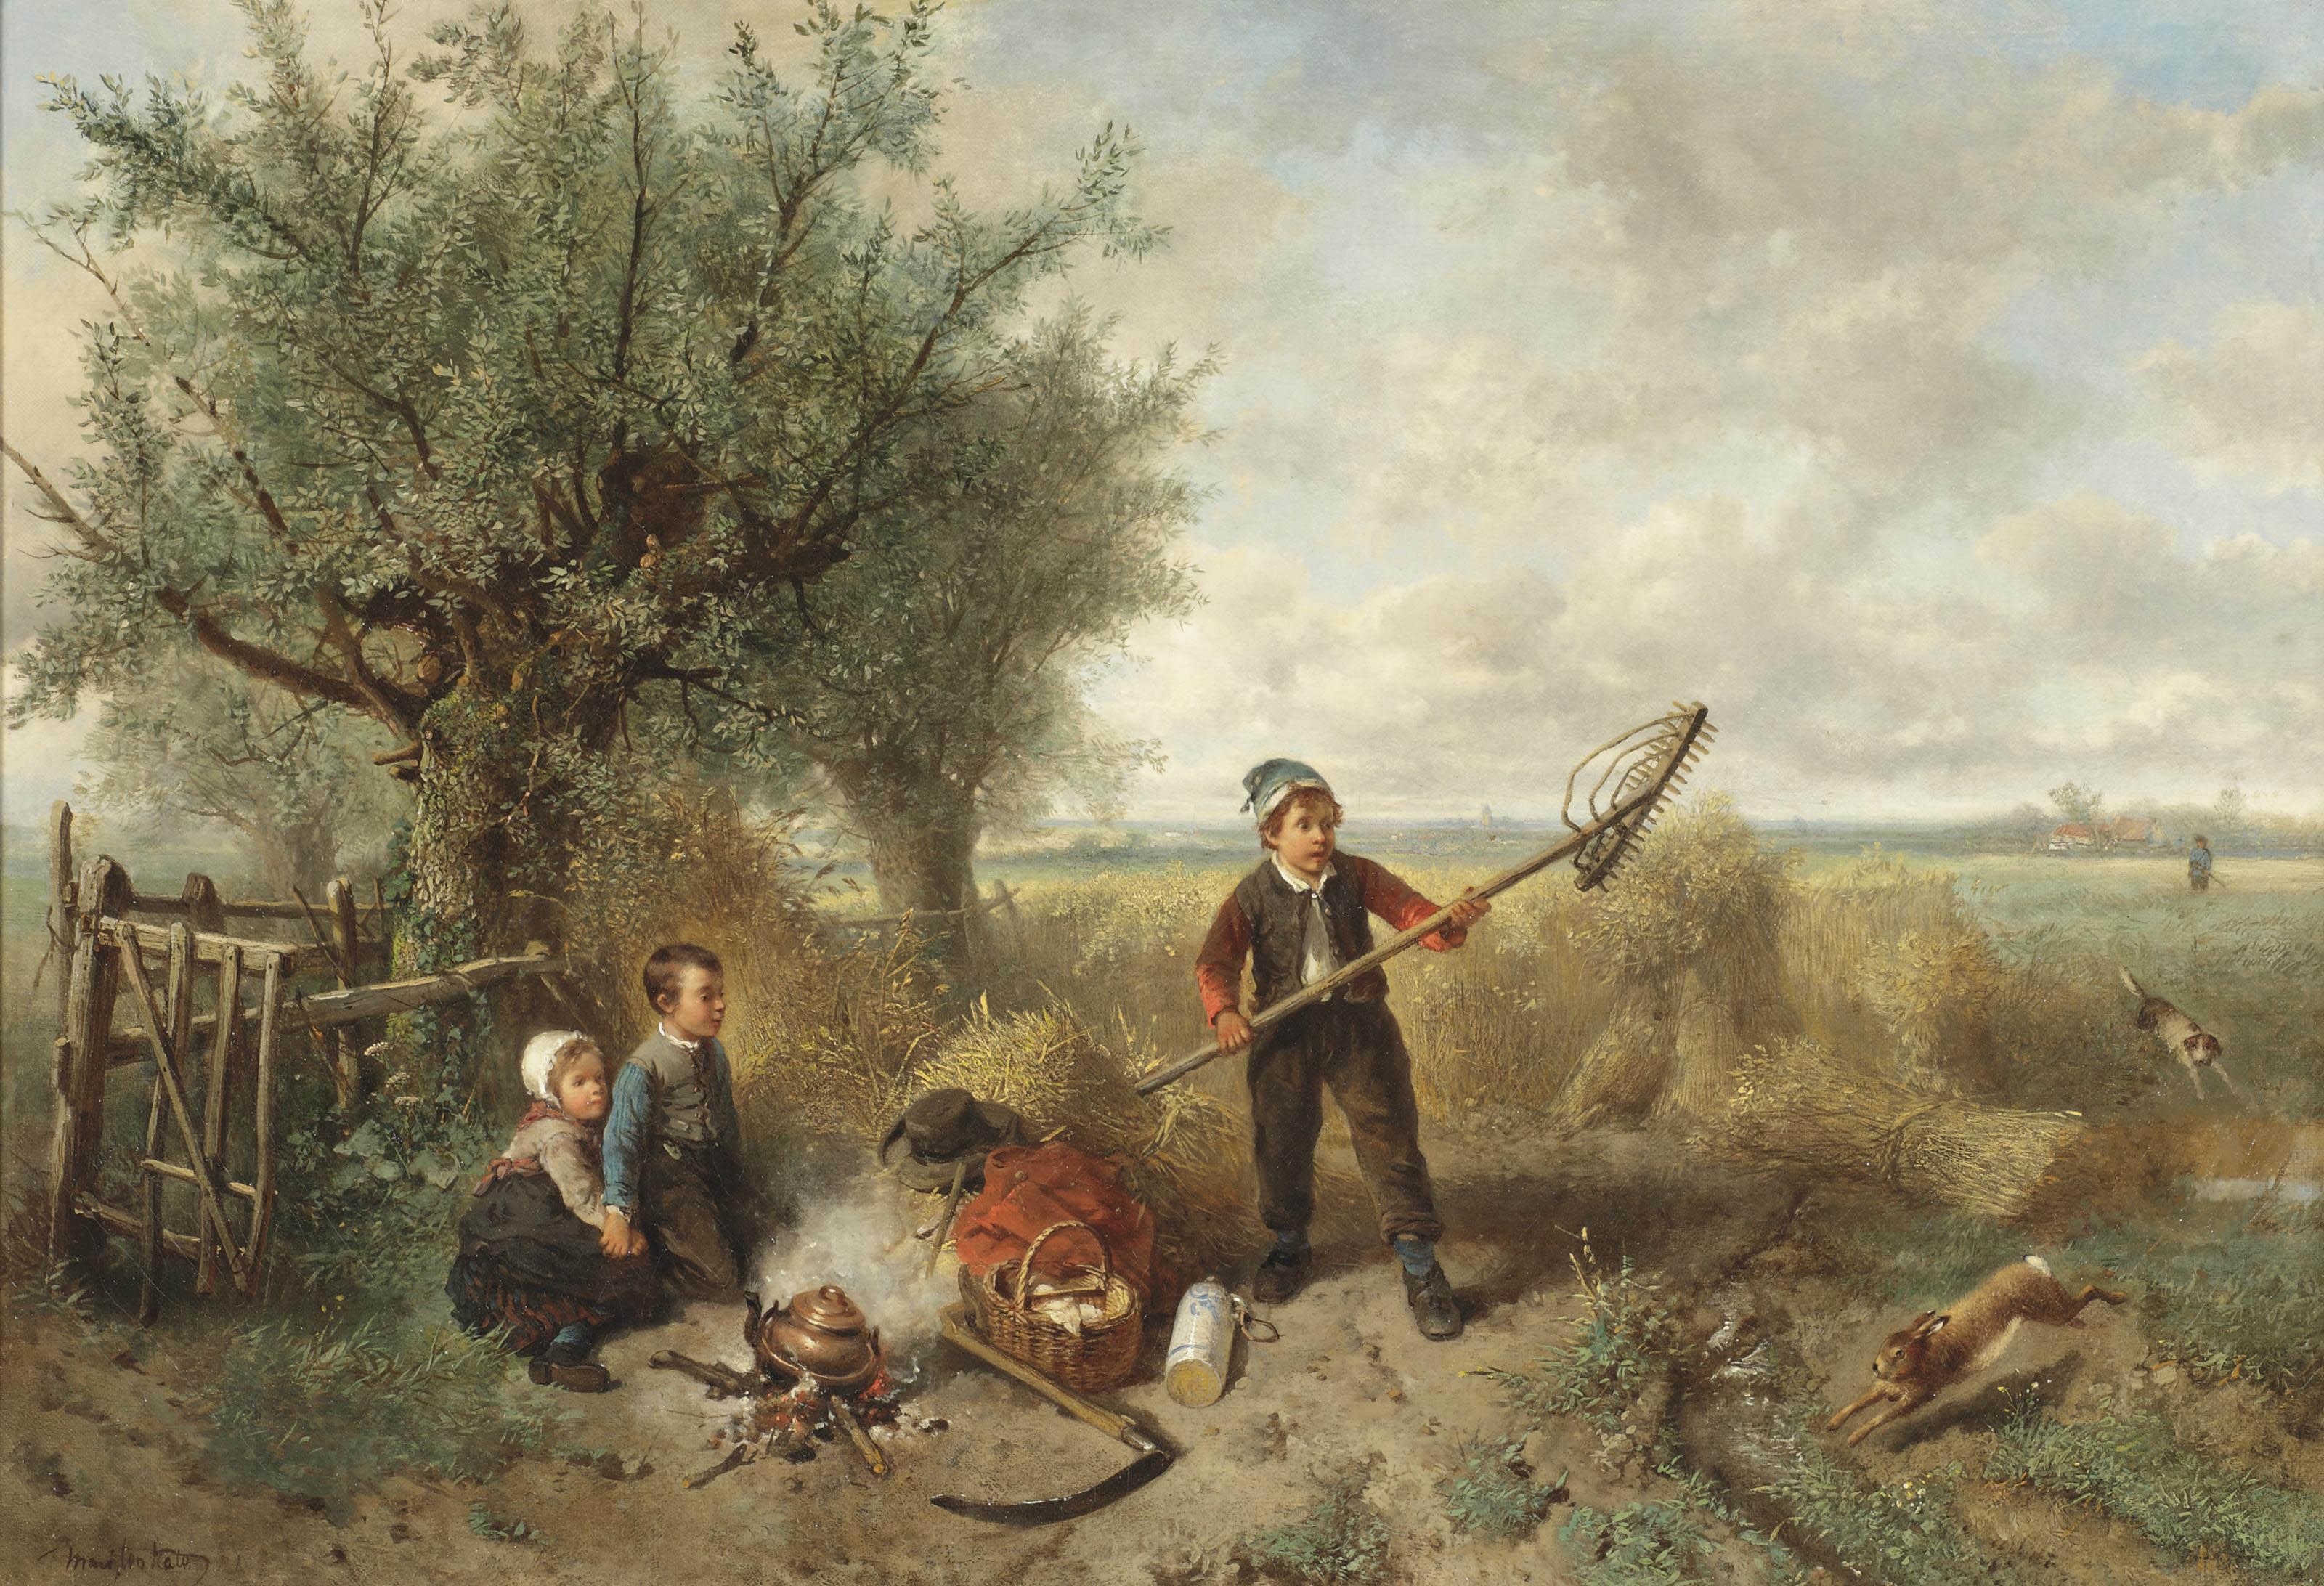 Interrupting the picknick